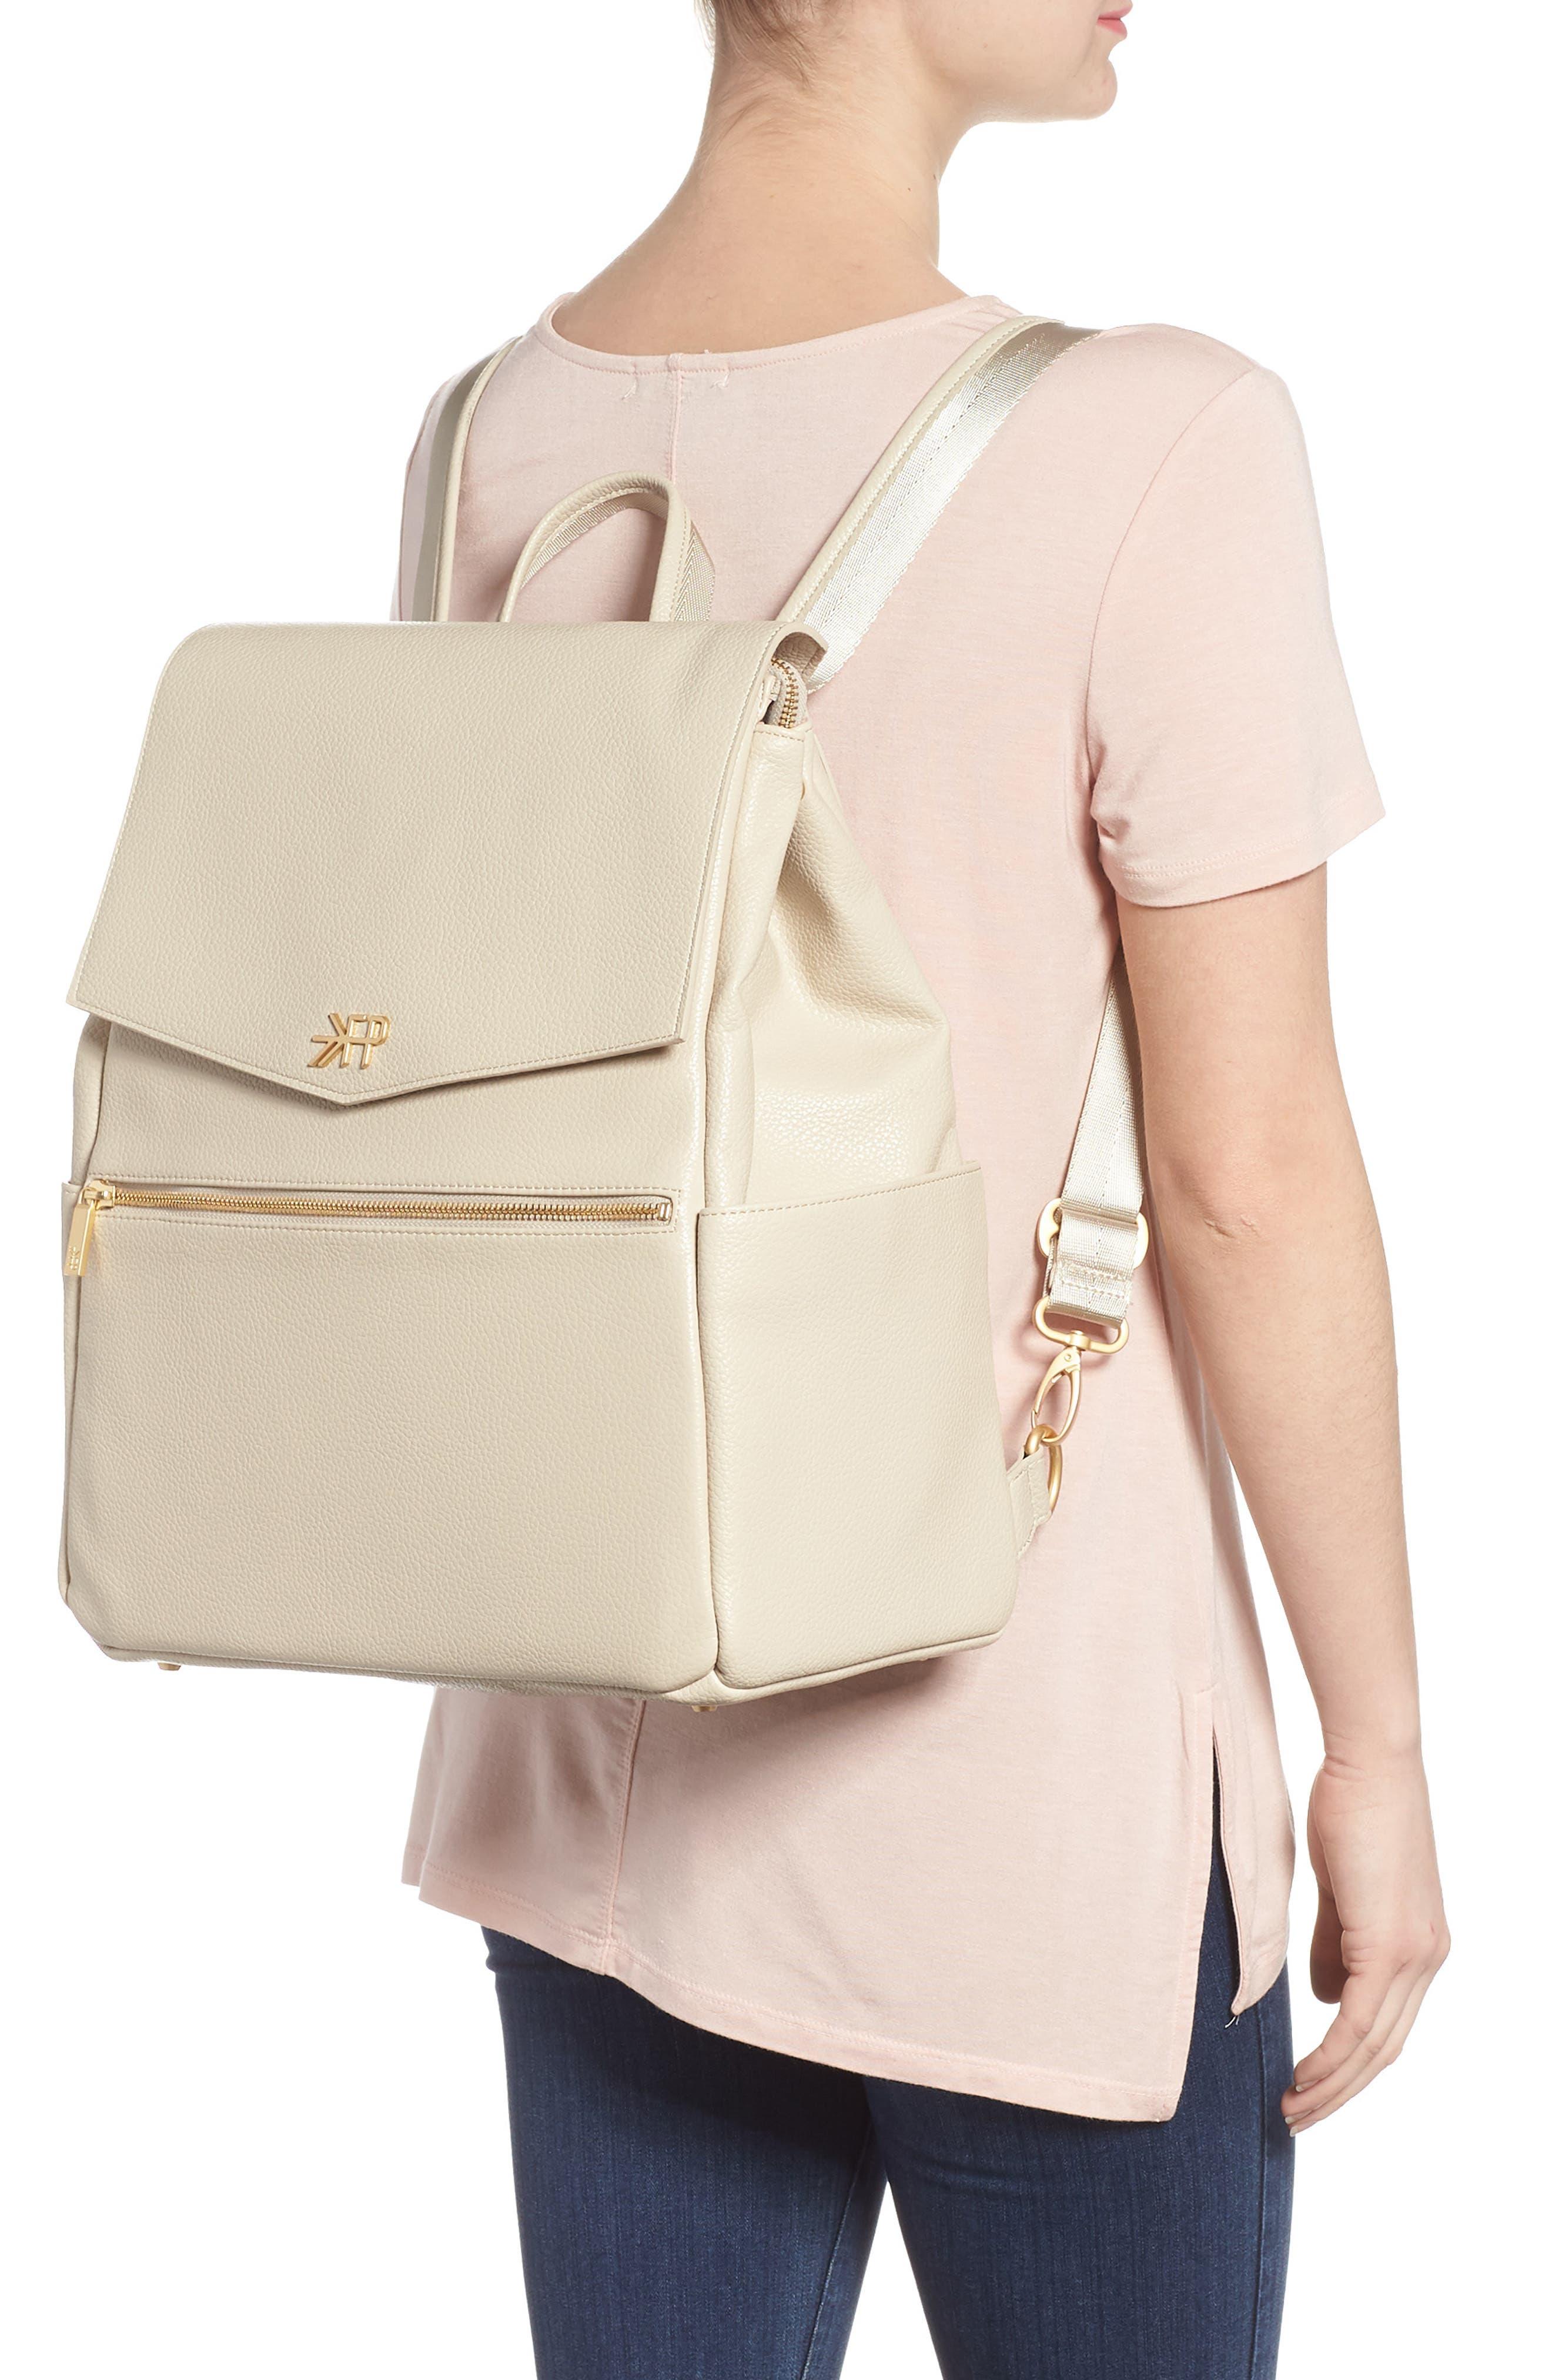 Convertible Diaper Backpack,                             Alternate thumbnail 10, color,